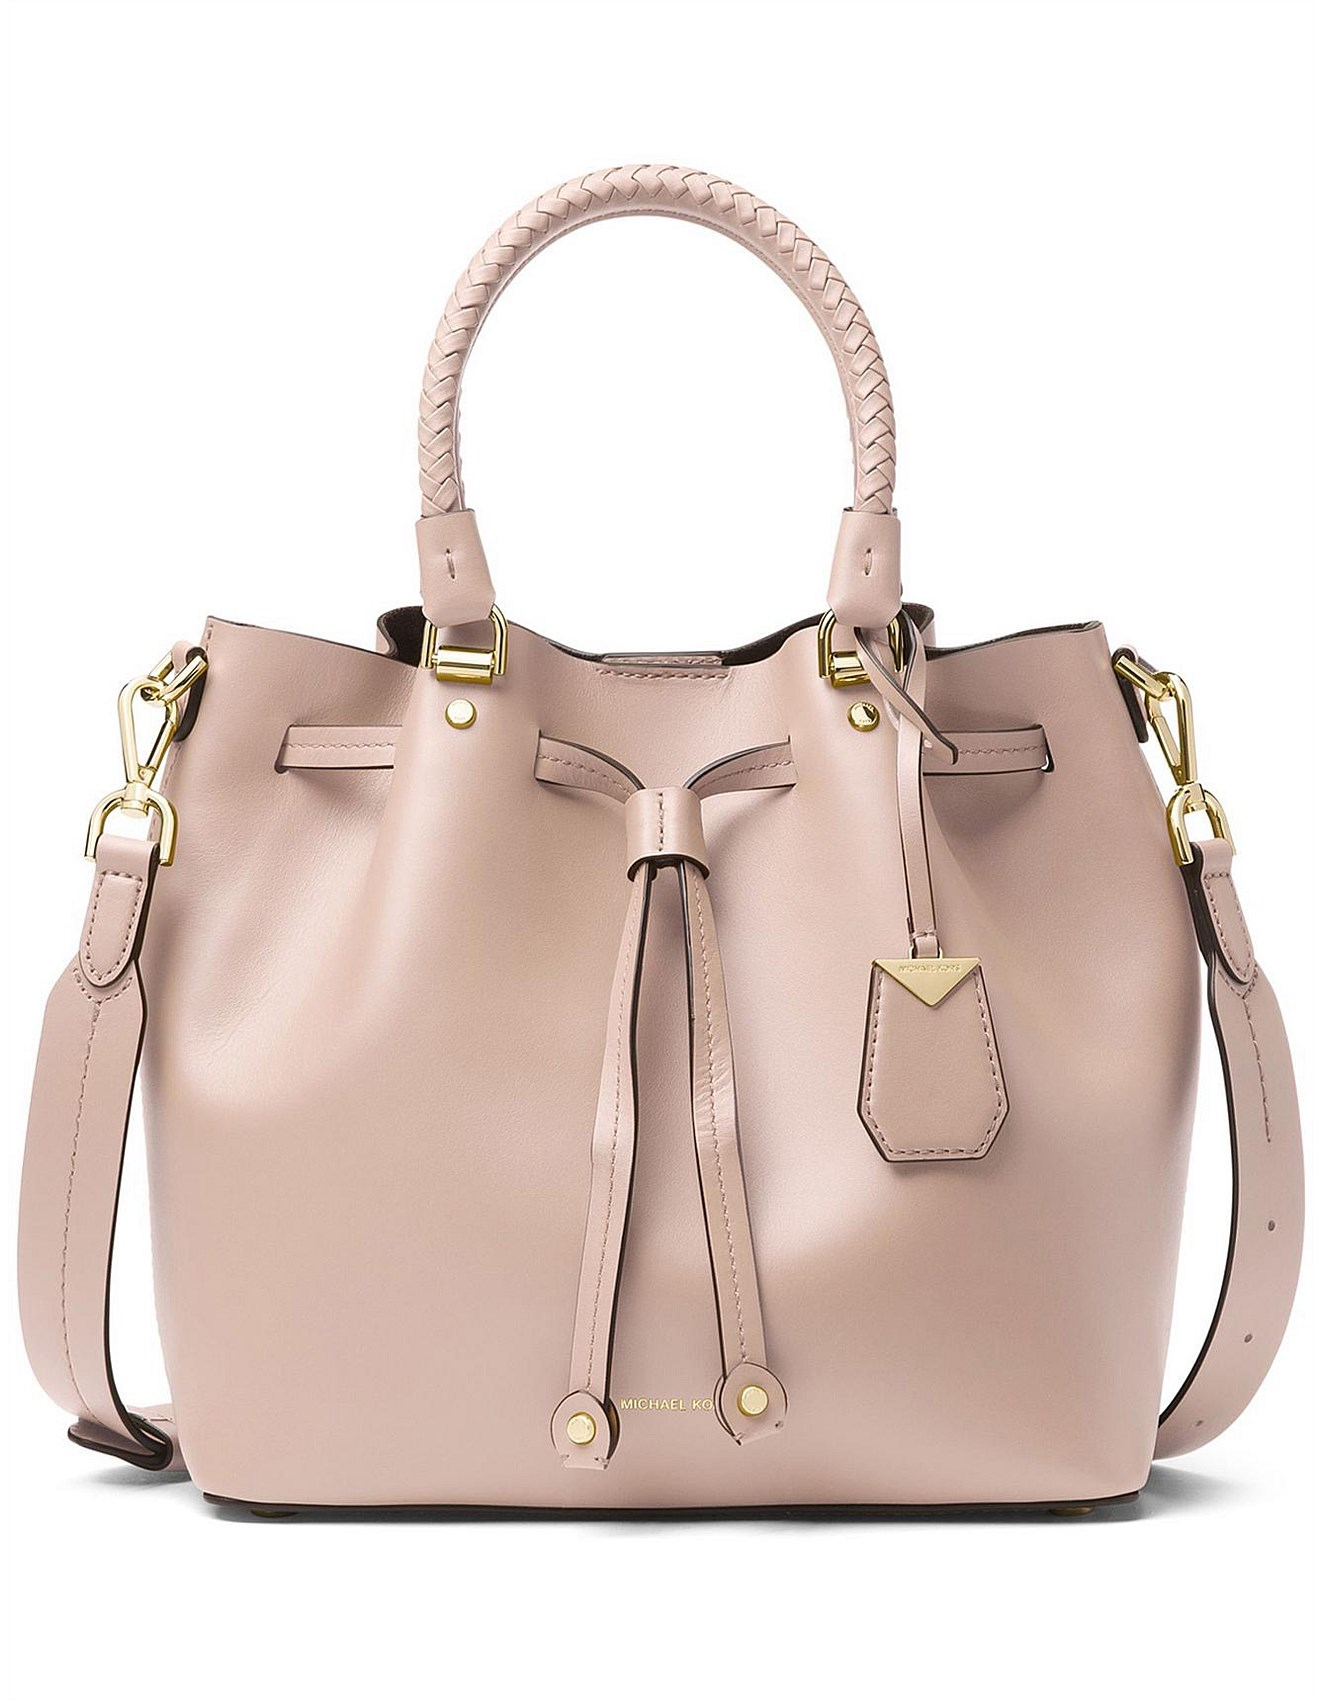 8075c1726c Blakely Leather Bucket Bag